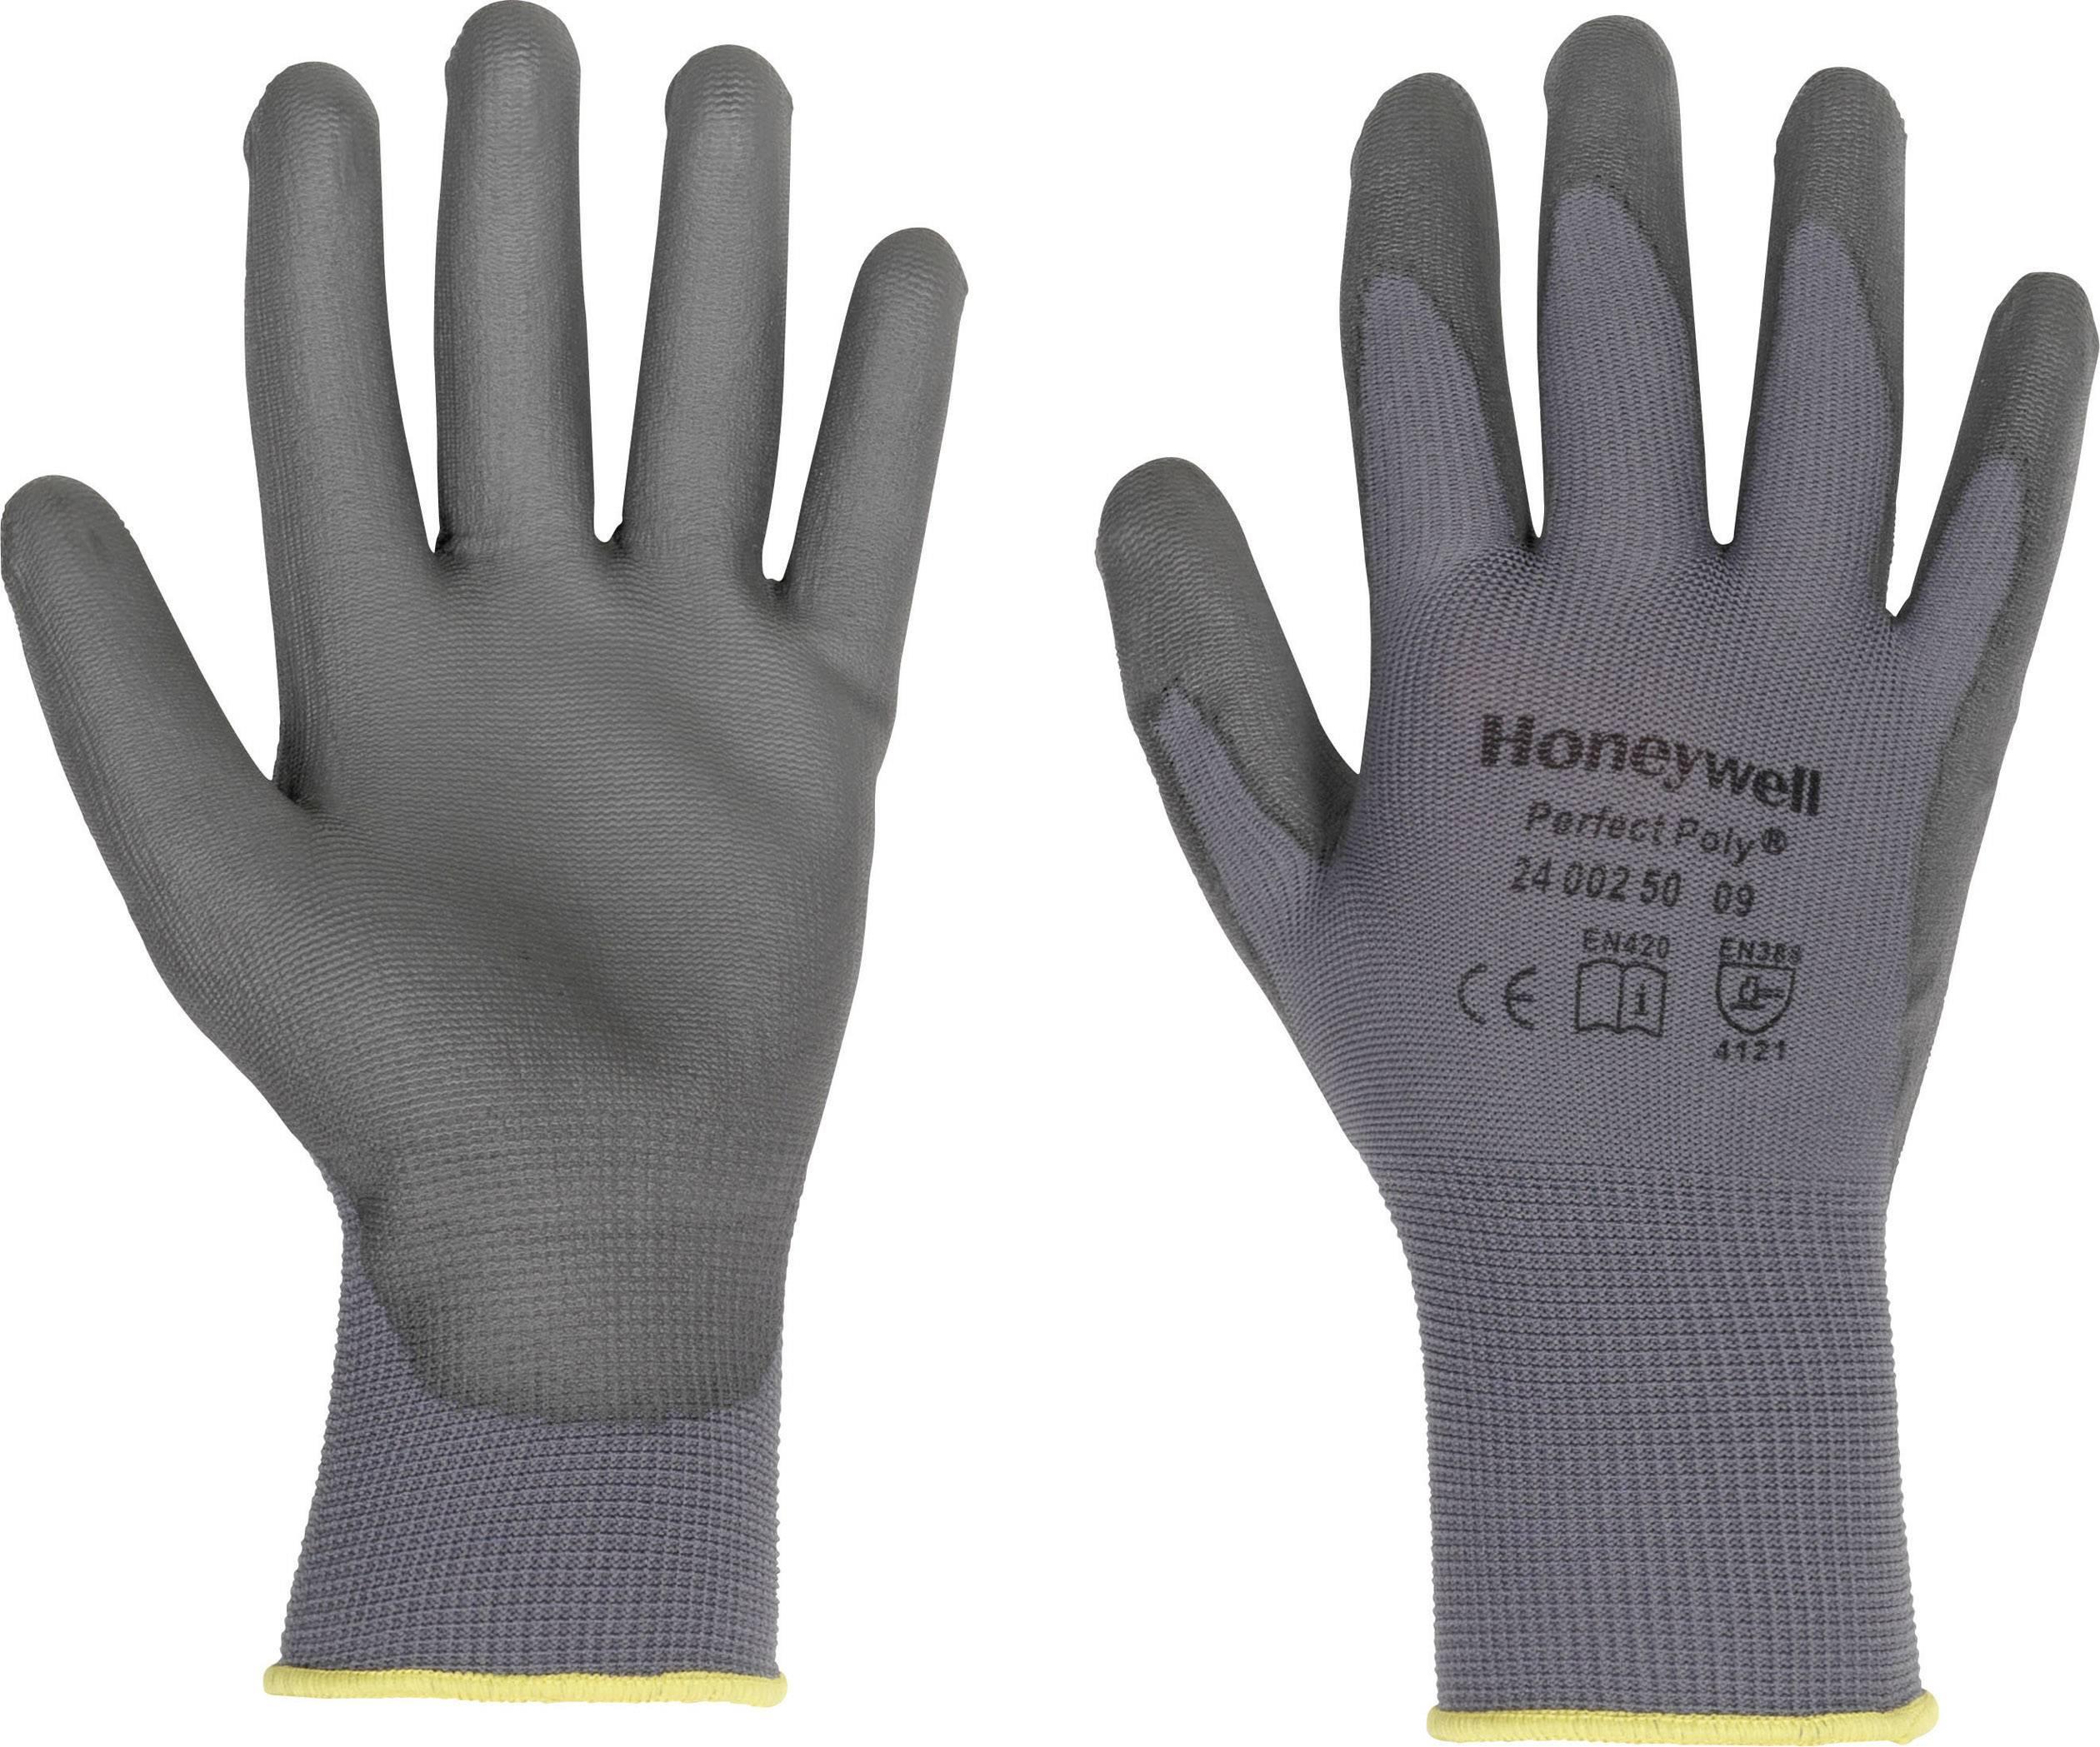 Pracovné rukavice Perfect Fit GANTS GRIS PERFECTPOLY 2400250, velikost rukavic: 7, S